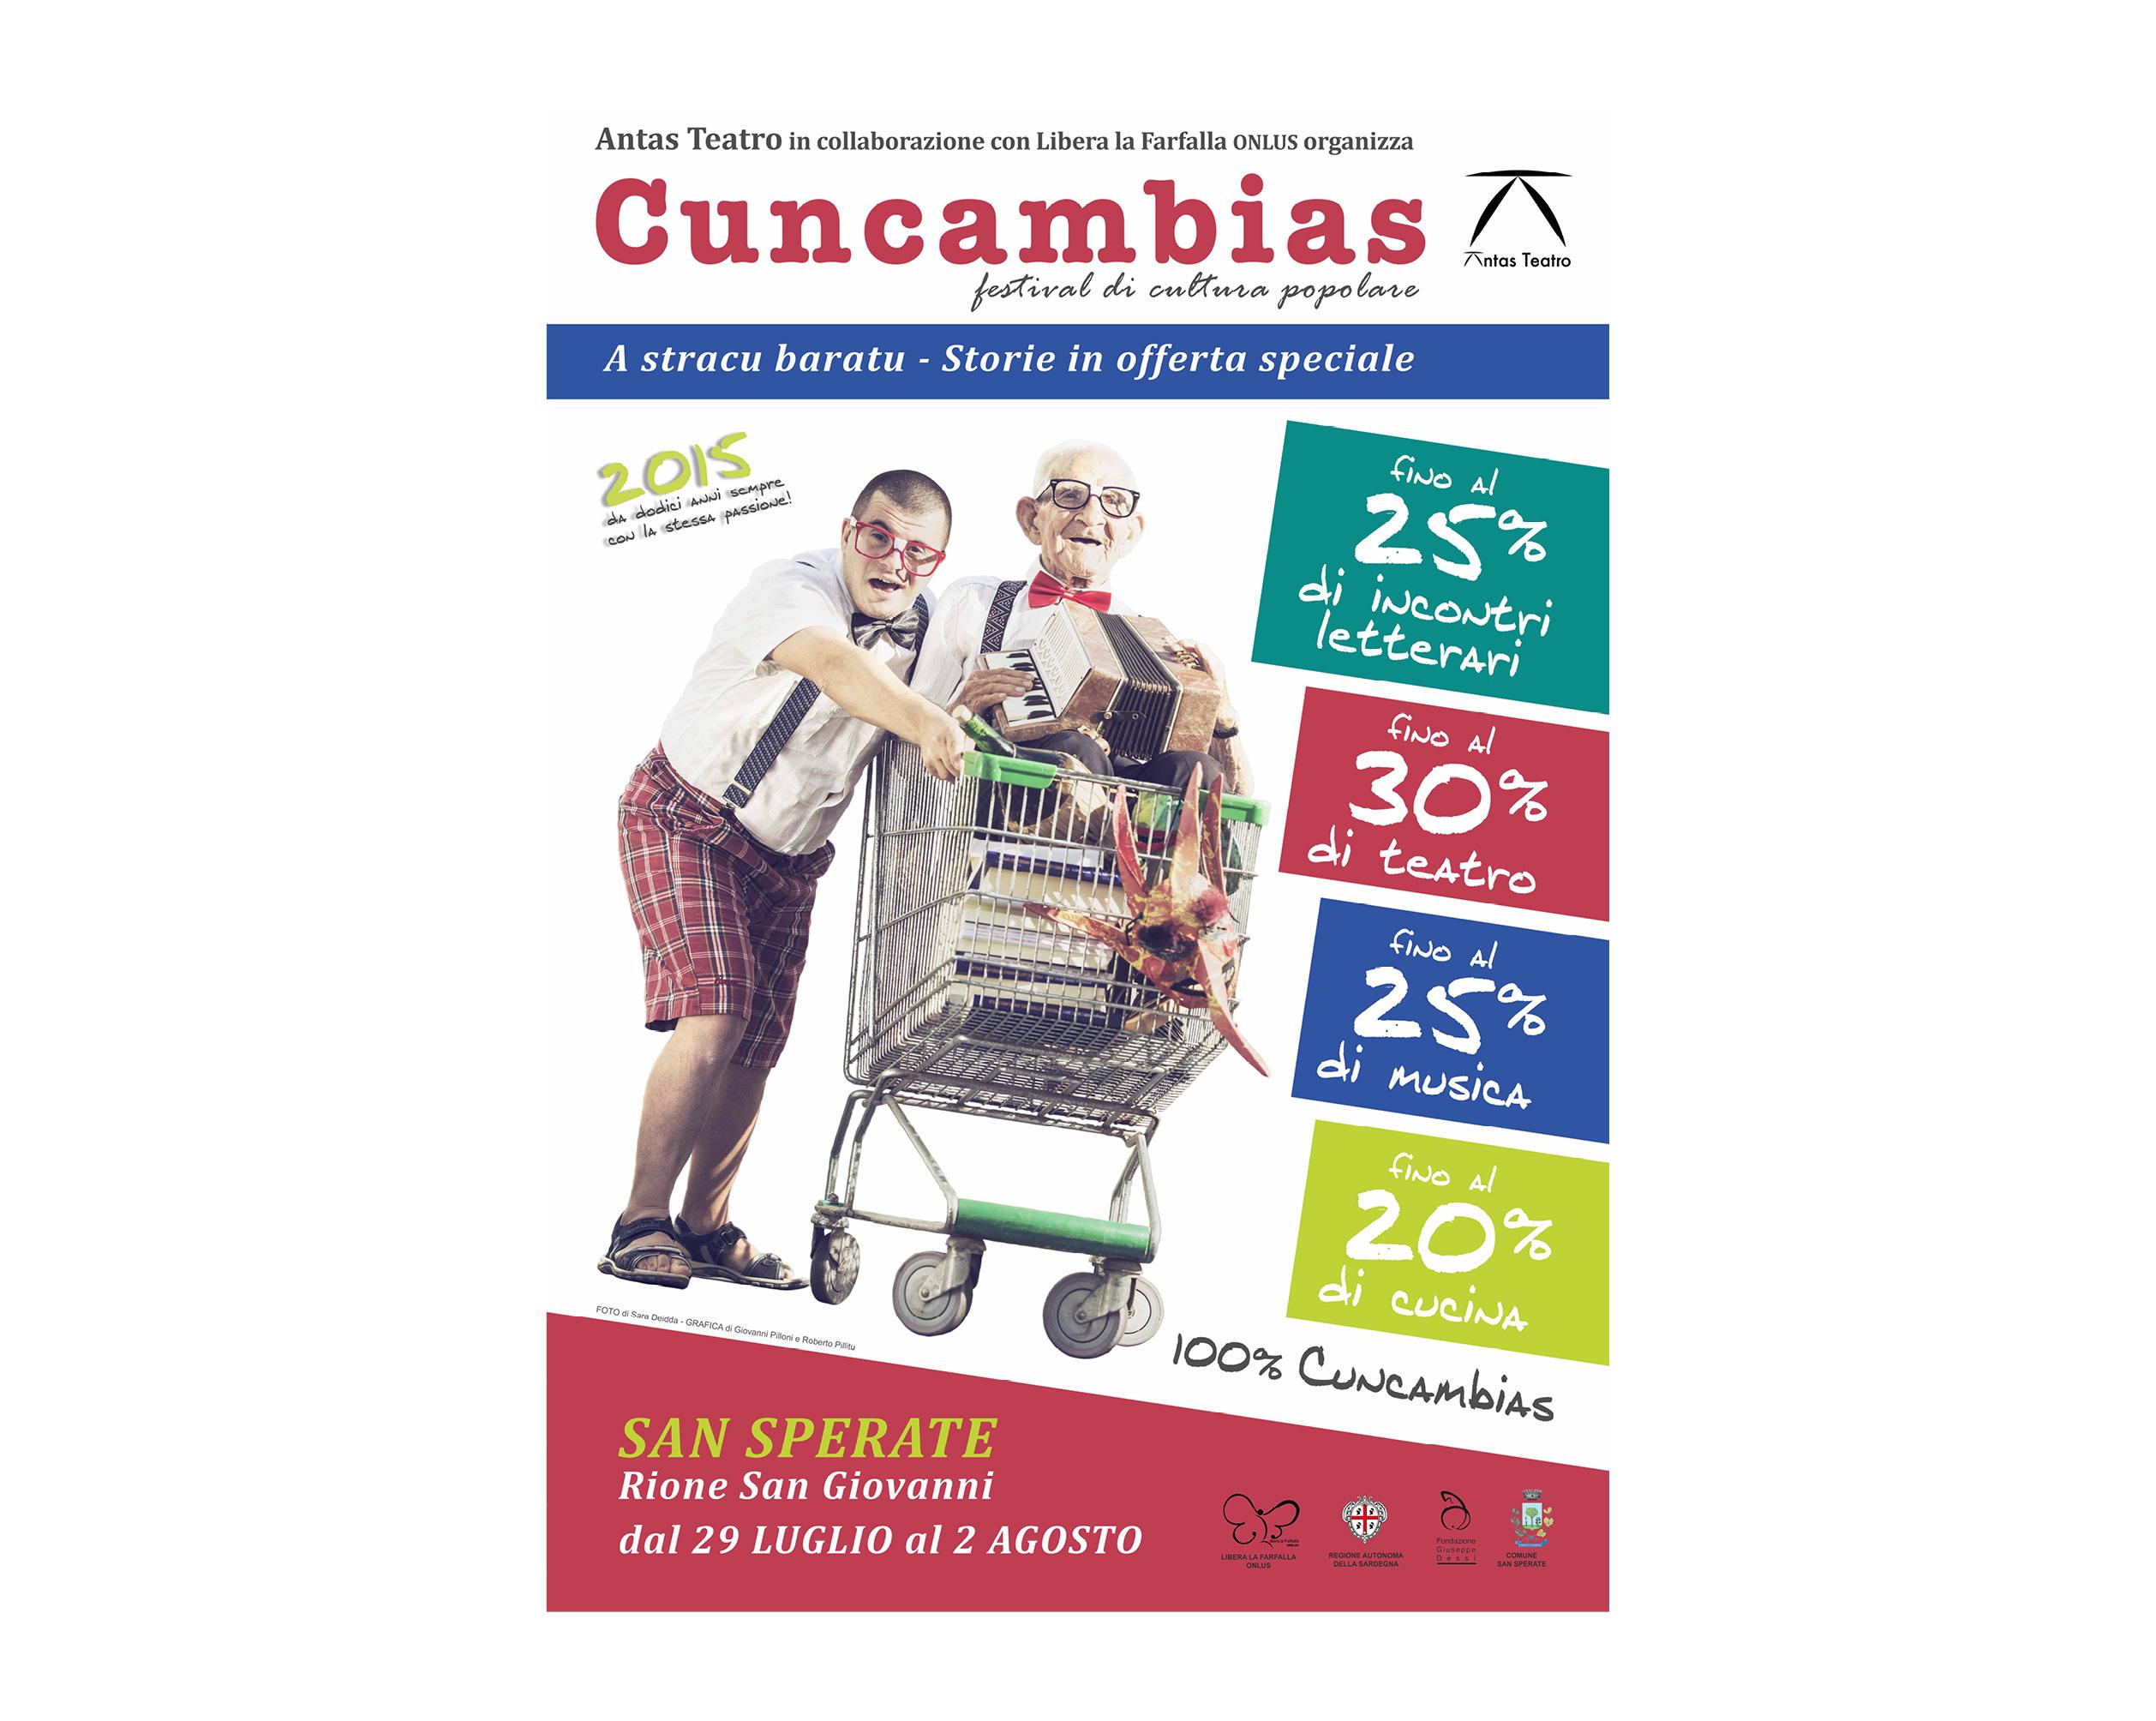 Cuncambias 2015